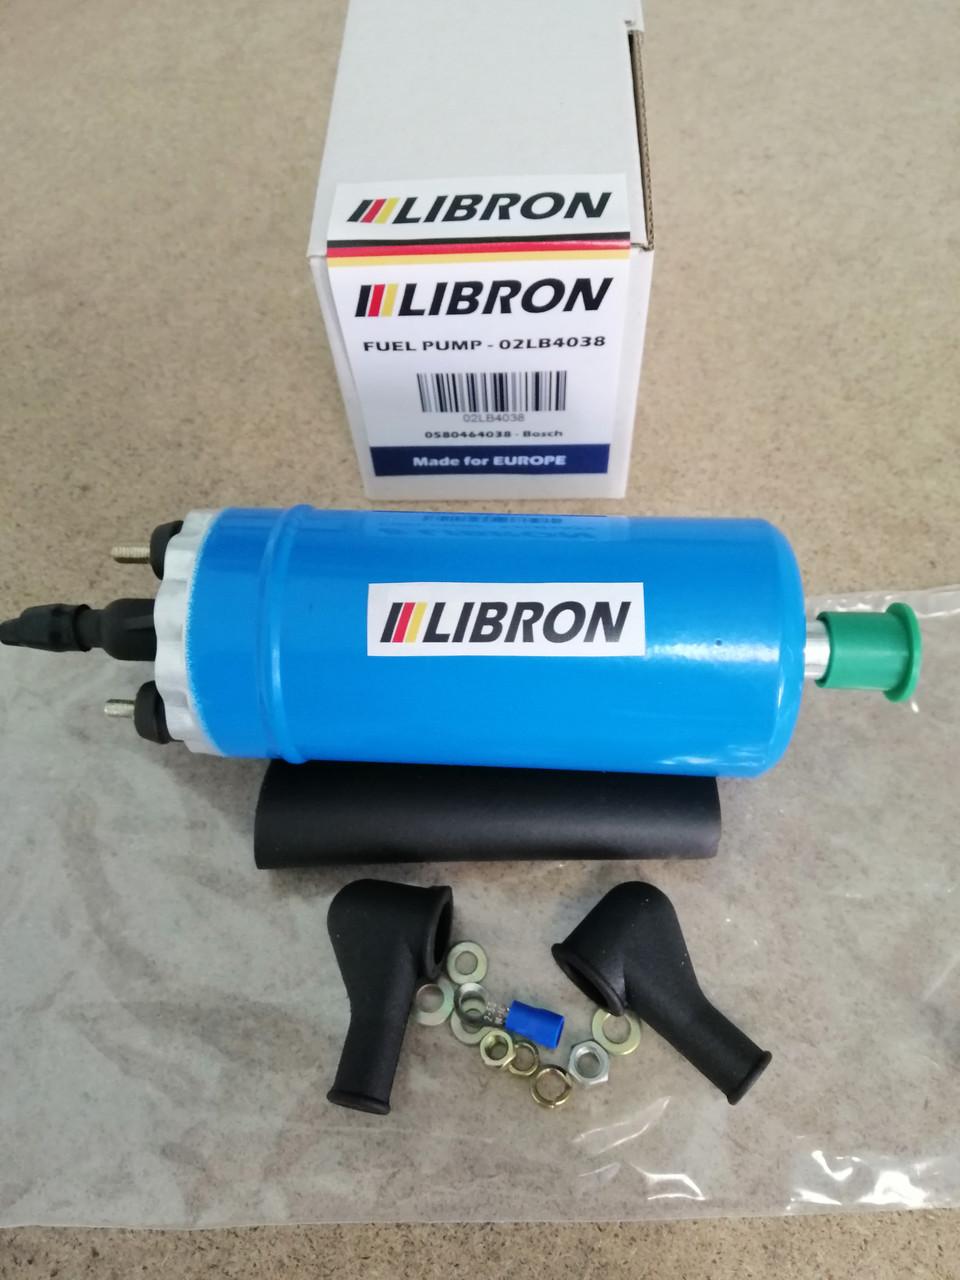 Бензонасос LIBRON 02LB4038 - ALFA ROMEO 75 (162B) 2.0 T.S. (162.B4A) (1987-1988)